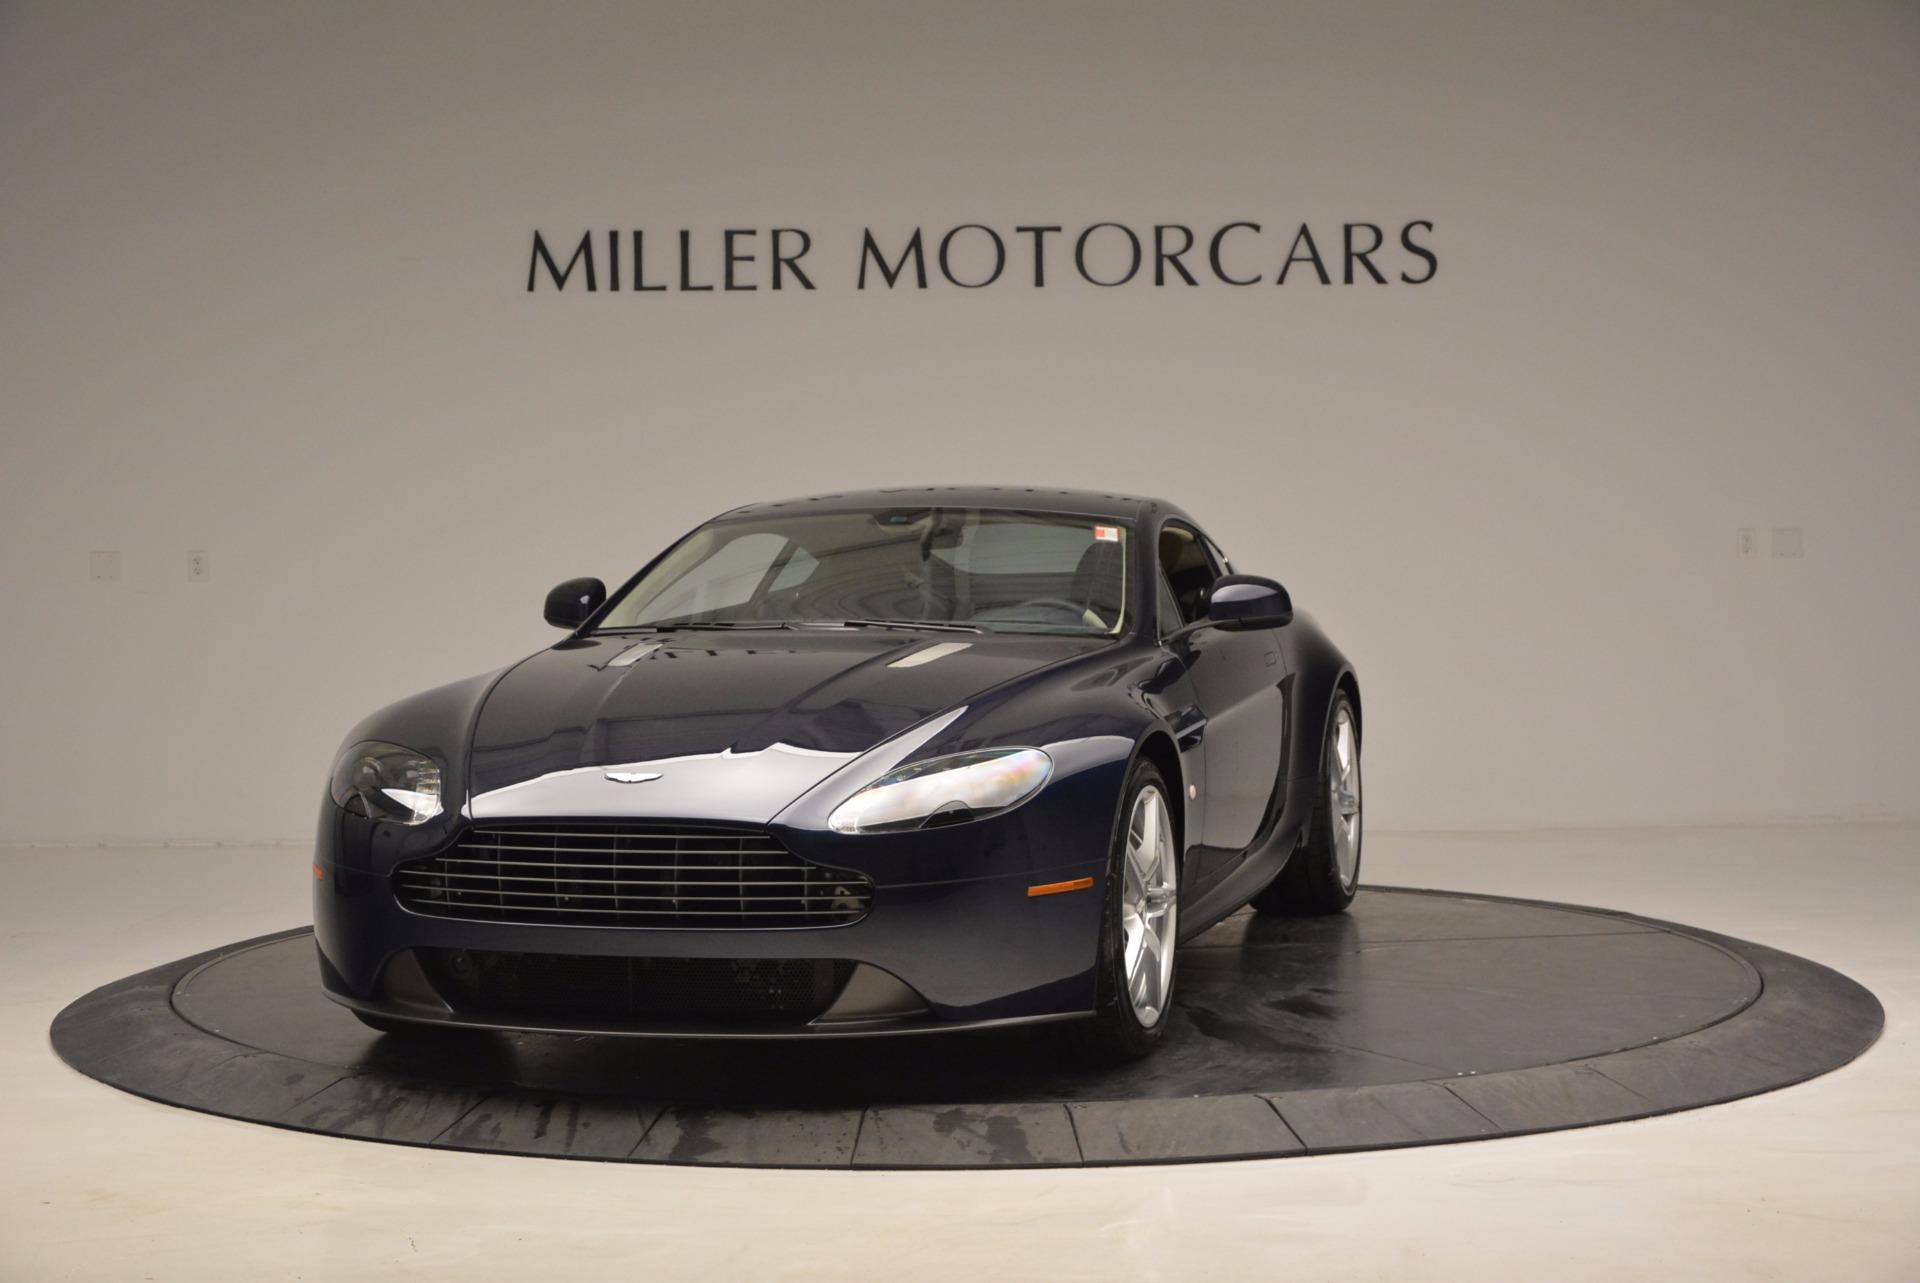 Used 2016 Aston Martin V8 Vantage for sale Sold at Maserati of Westport in Westport CT 06880 1